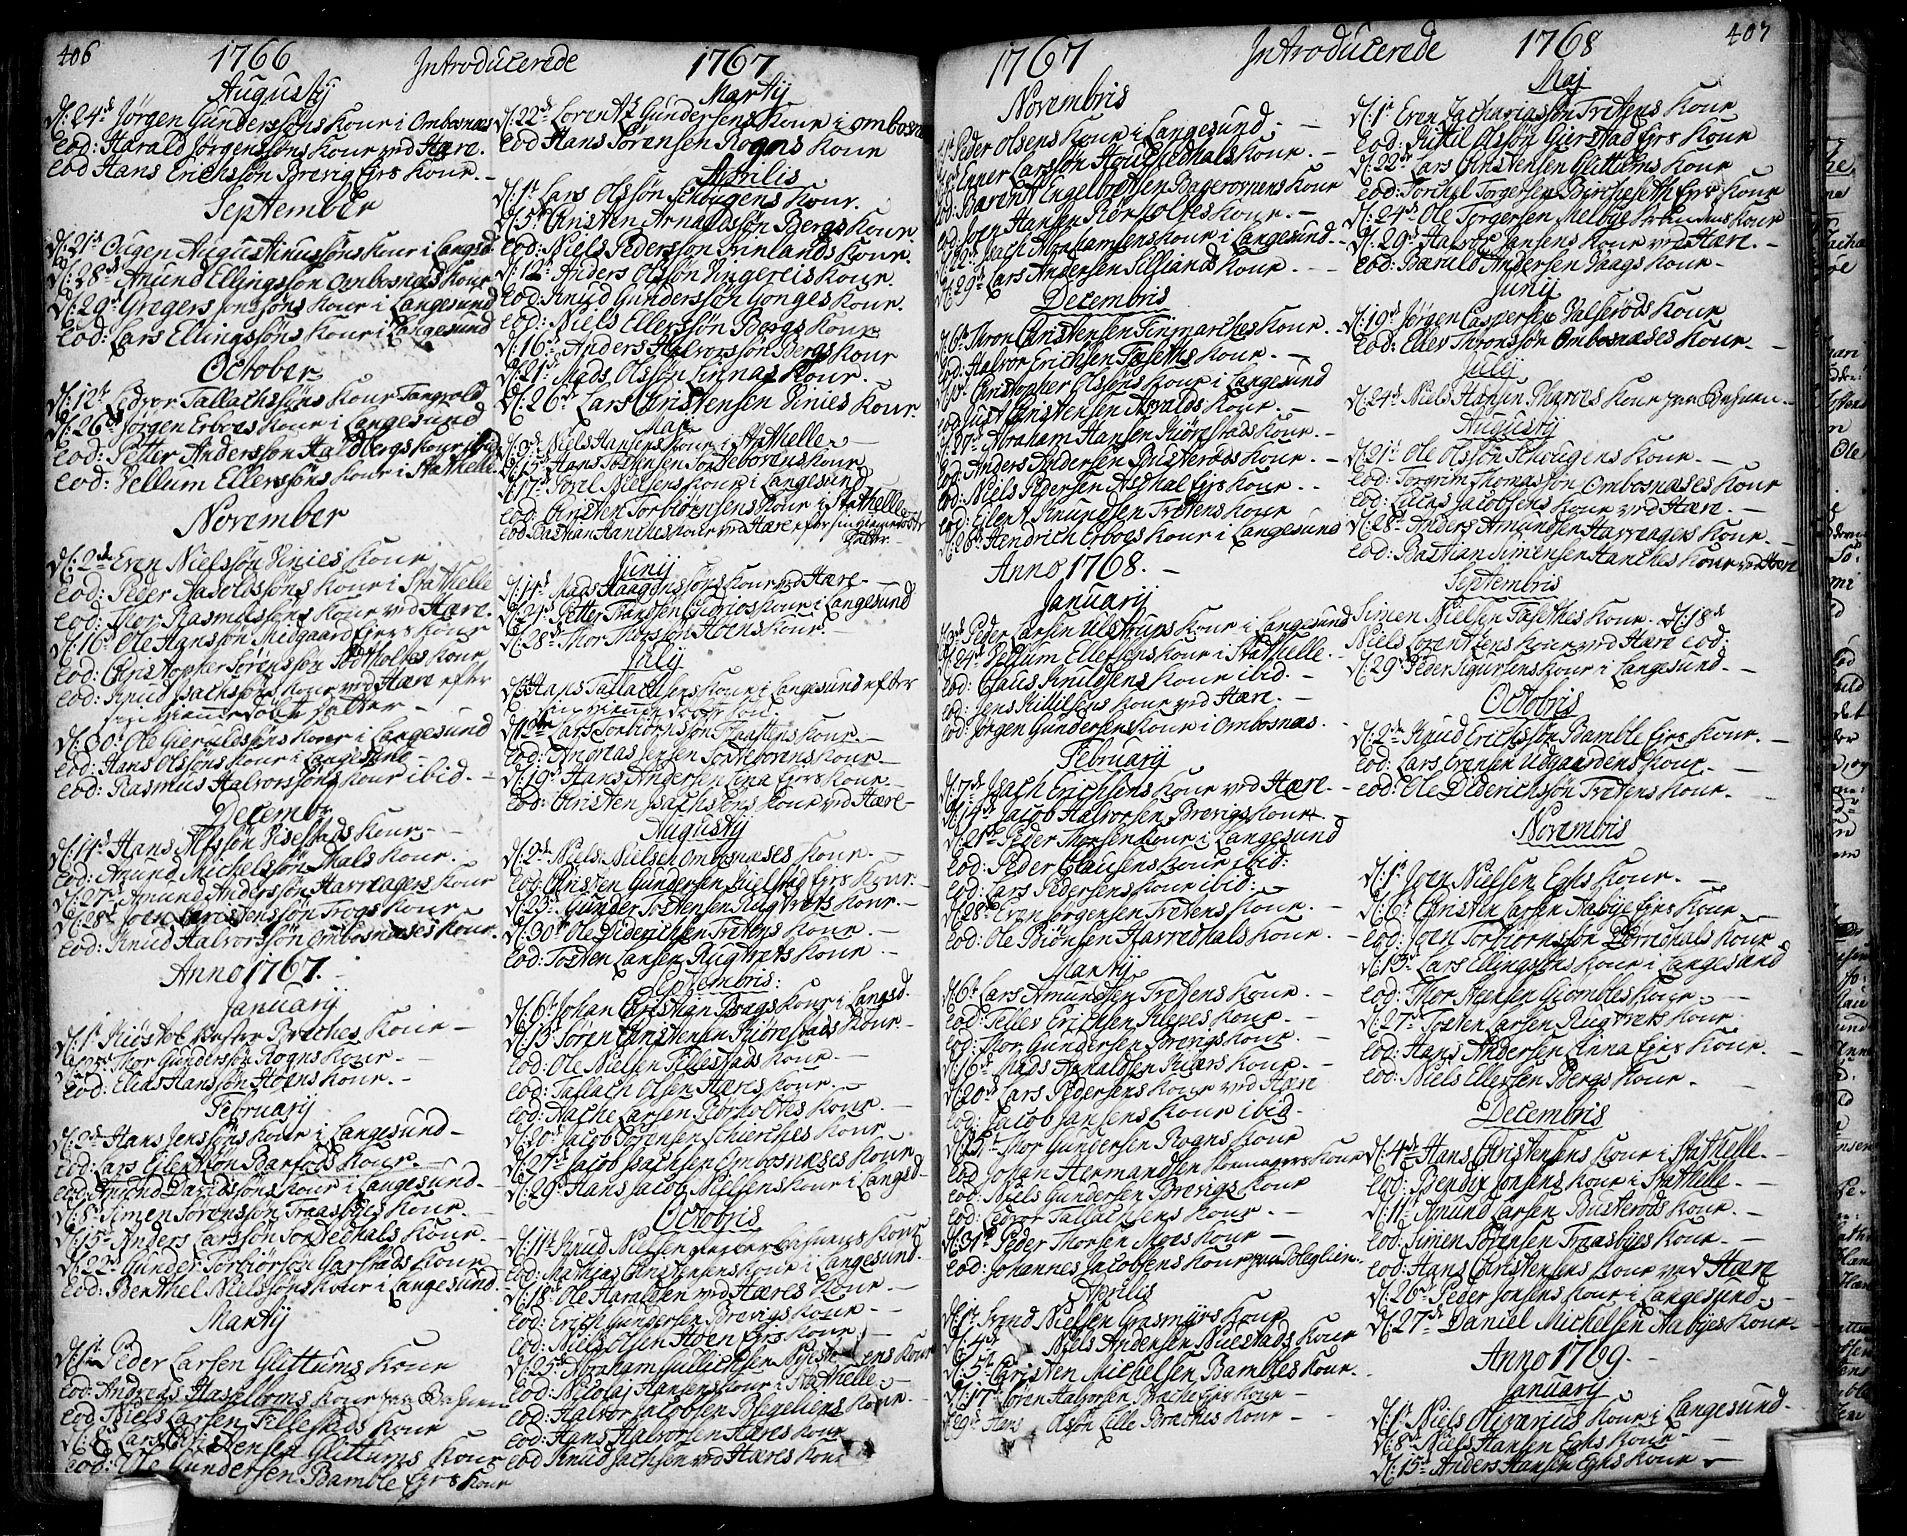 SAKO, Bamble kirkebøker, F/Fa/L0001: Ministerialbok nr. I 1, 1702-1774, s. 406-407